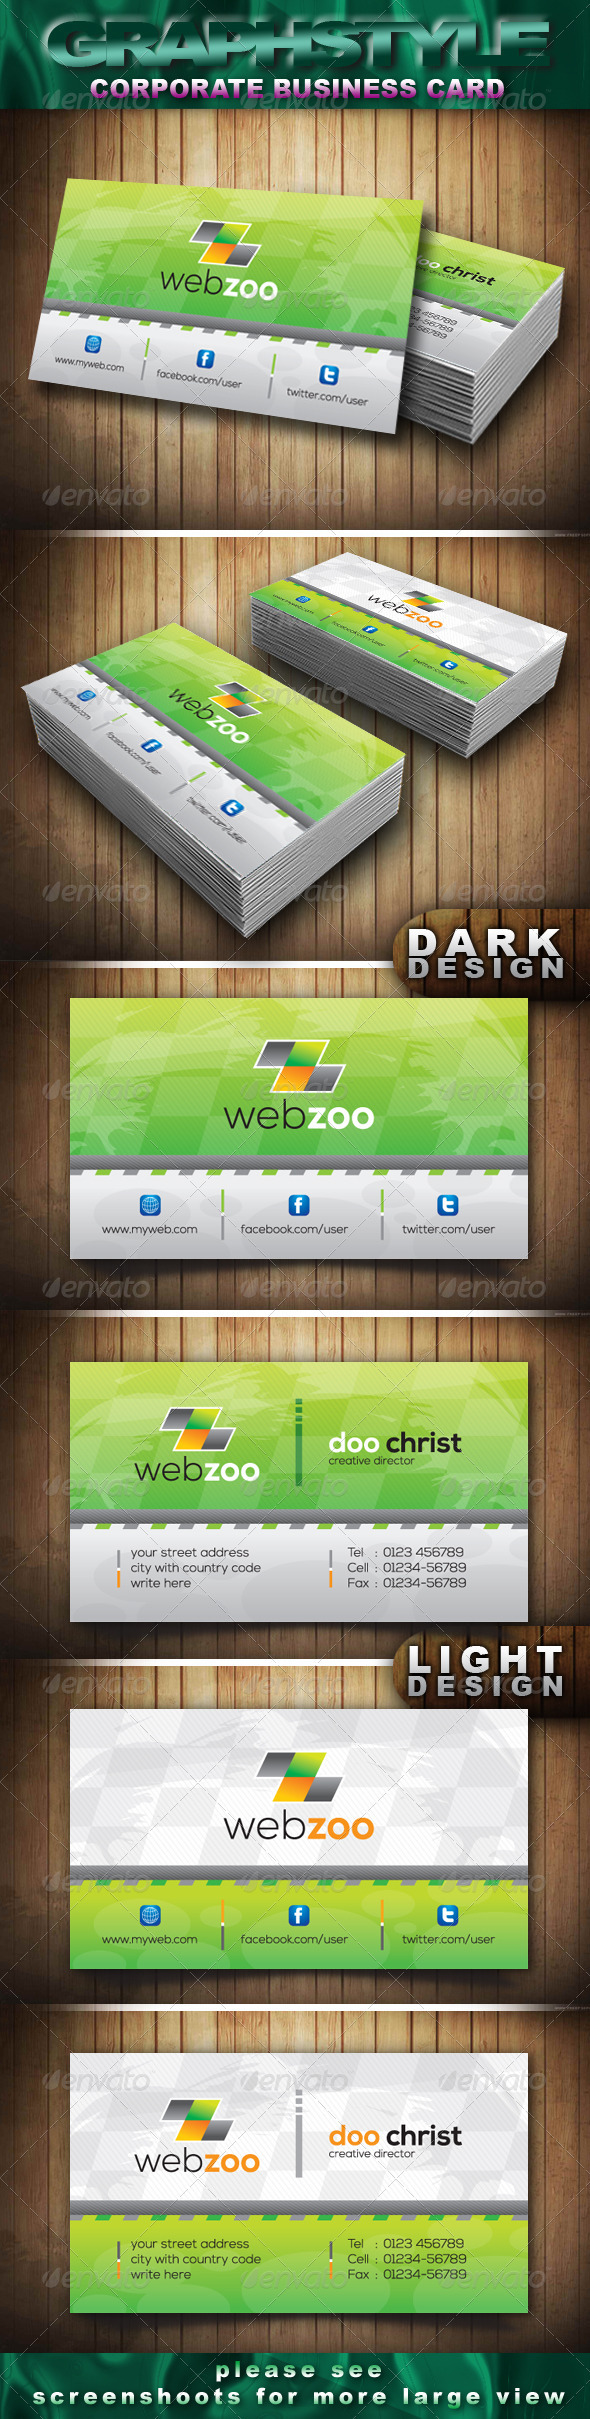 Webzoo Corporate Business Card - Corporate Business Cards